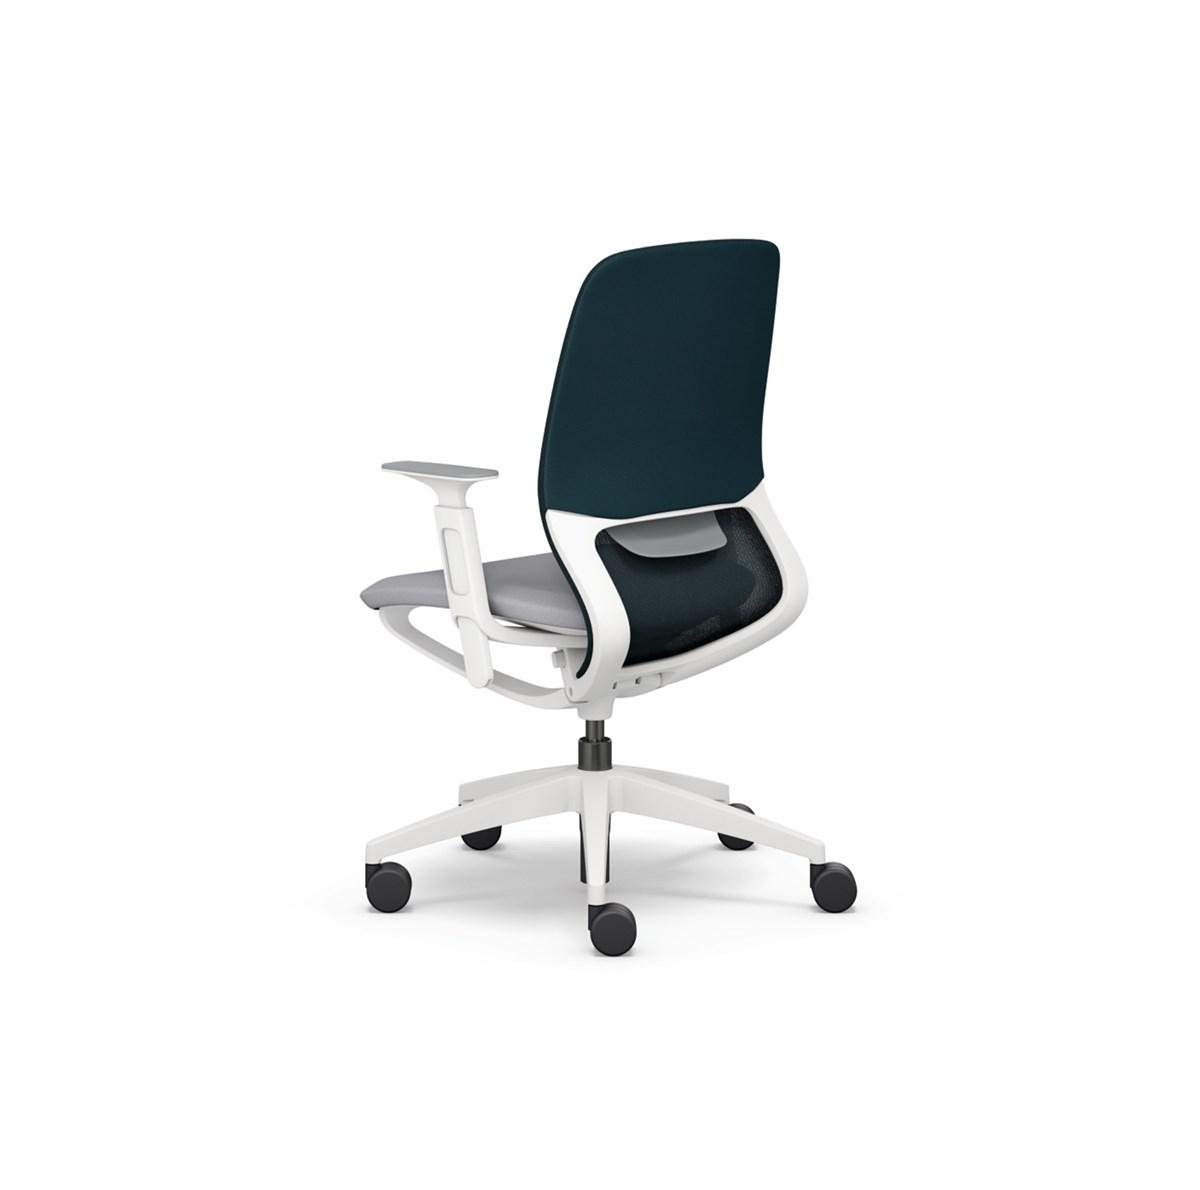 Sedus-Se:motion-Net-Chair-Matisse-2